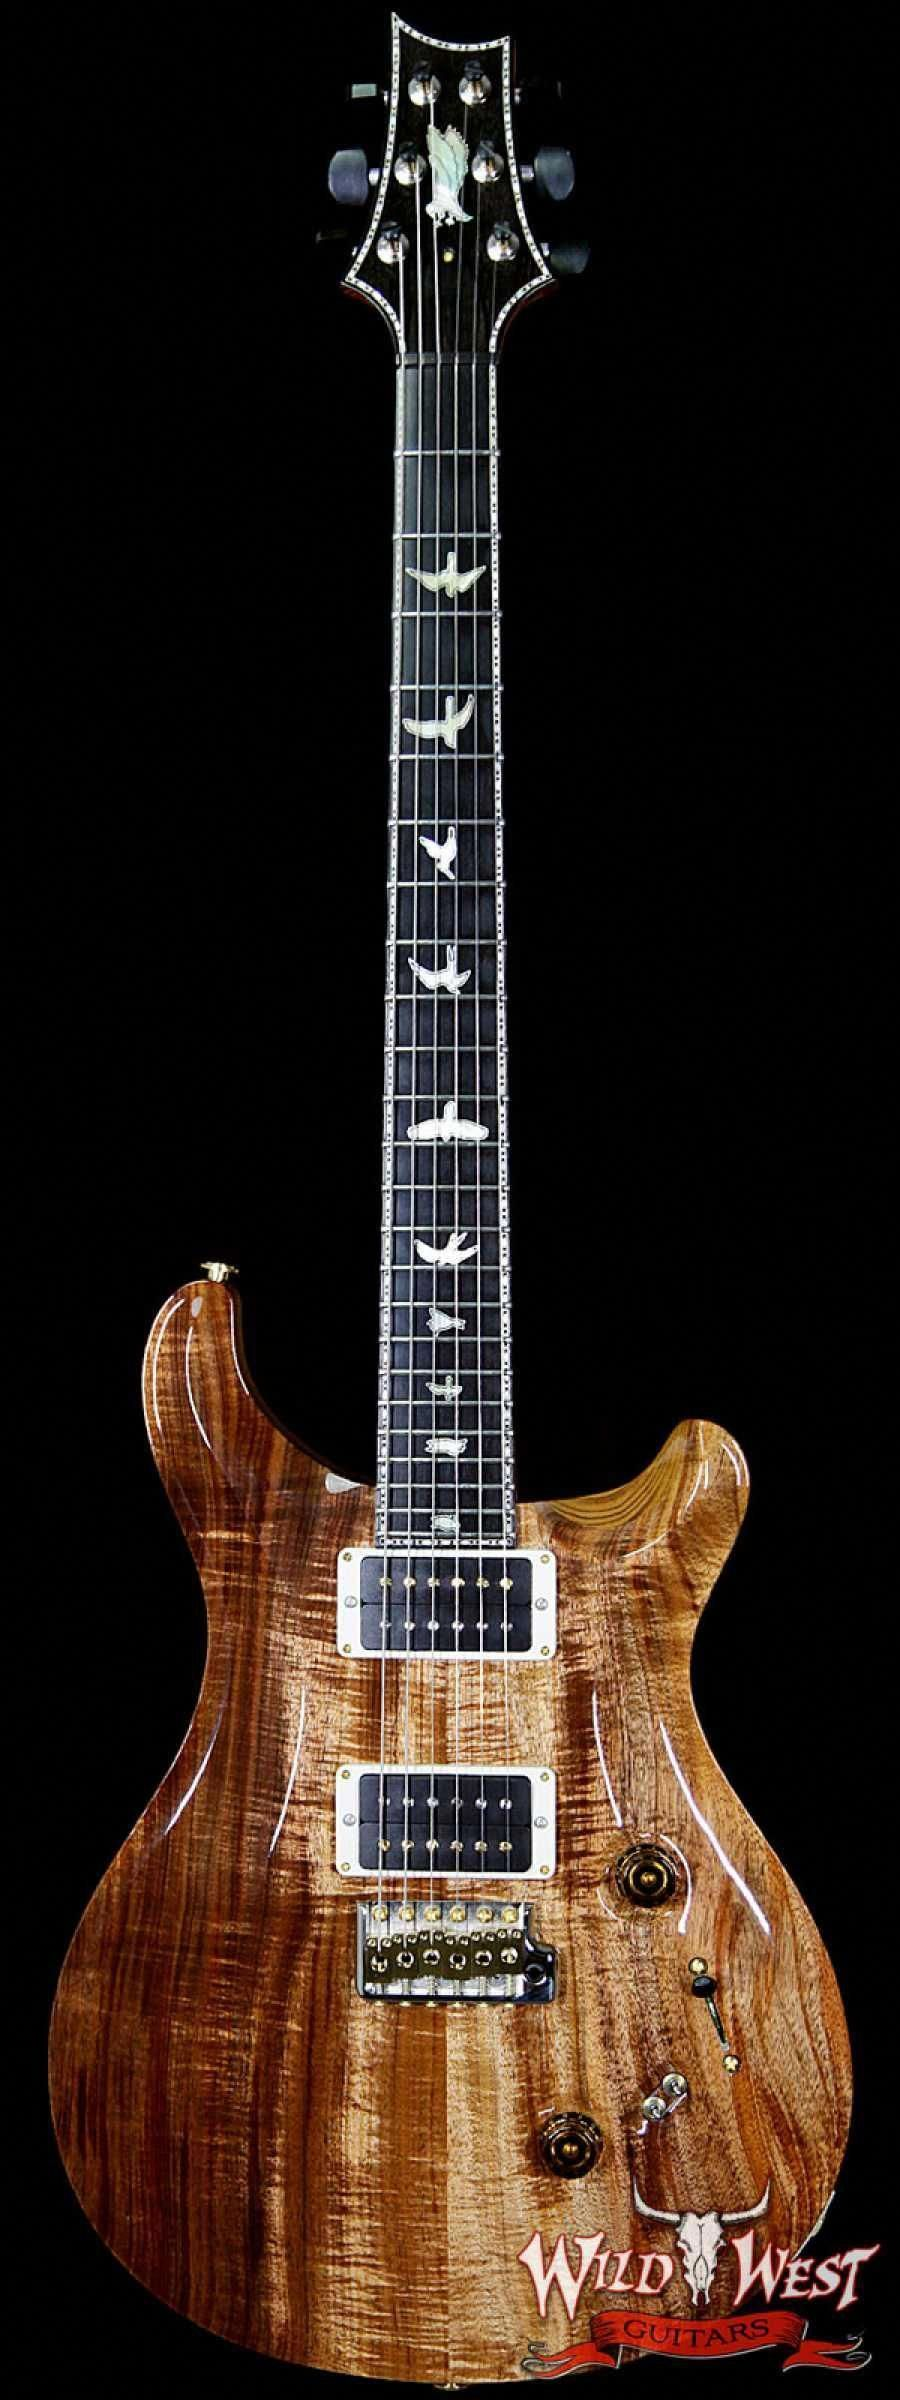 PRS Guitar Custom 24 PRS Guitar Hard Case #guitarras #guitarsofinstagram #PRSGuitars #prsguitar PRS Guitar Custom 24 PRS Guitar Hard Case #guitarras #guitarsofinstagram #PRSGuitars #prsguitar PRS Guitar Custom 24 PRS Guitar Hard Case #guitarras #guitarsofinstagram #PRSGuitars #prsguitar PRS Guitar Custom 24 PRS Guitar Hard Case #guitarras #guitarsofinstagram #PRSGuitars #prsguitar